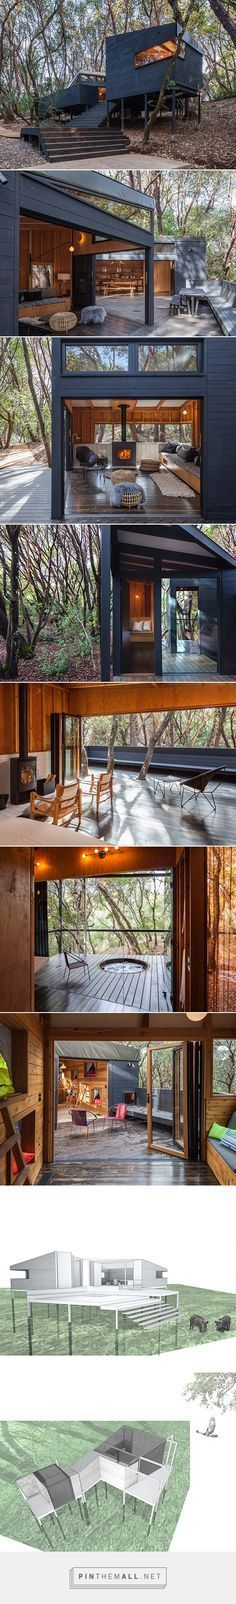 Forest House - envelopeA+D - created via https://pinthemall.net